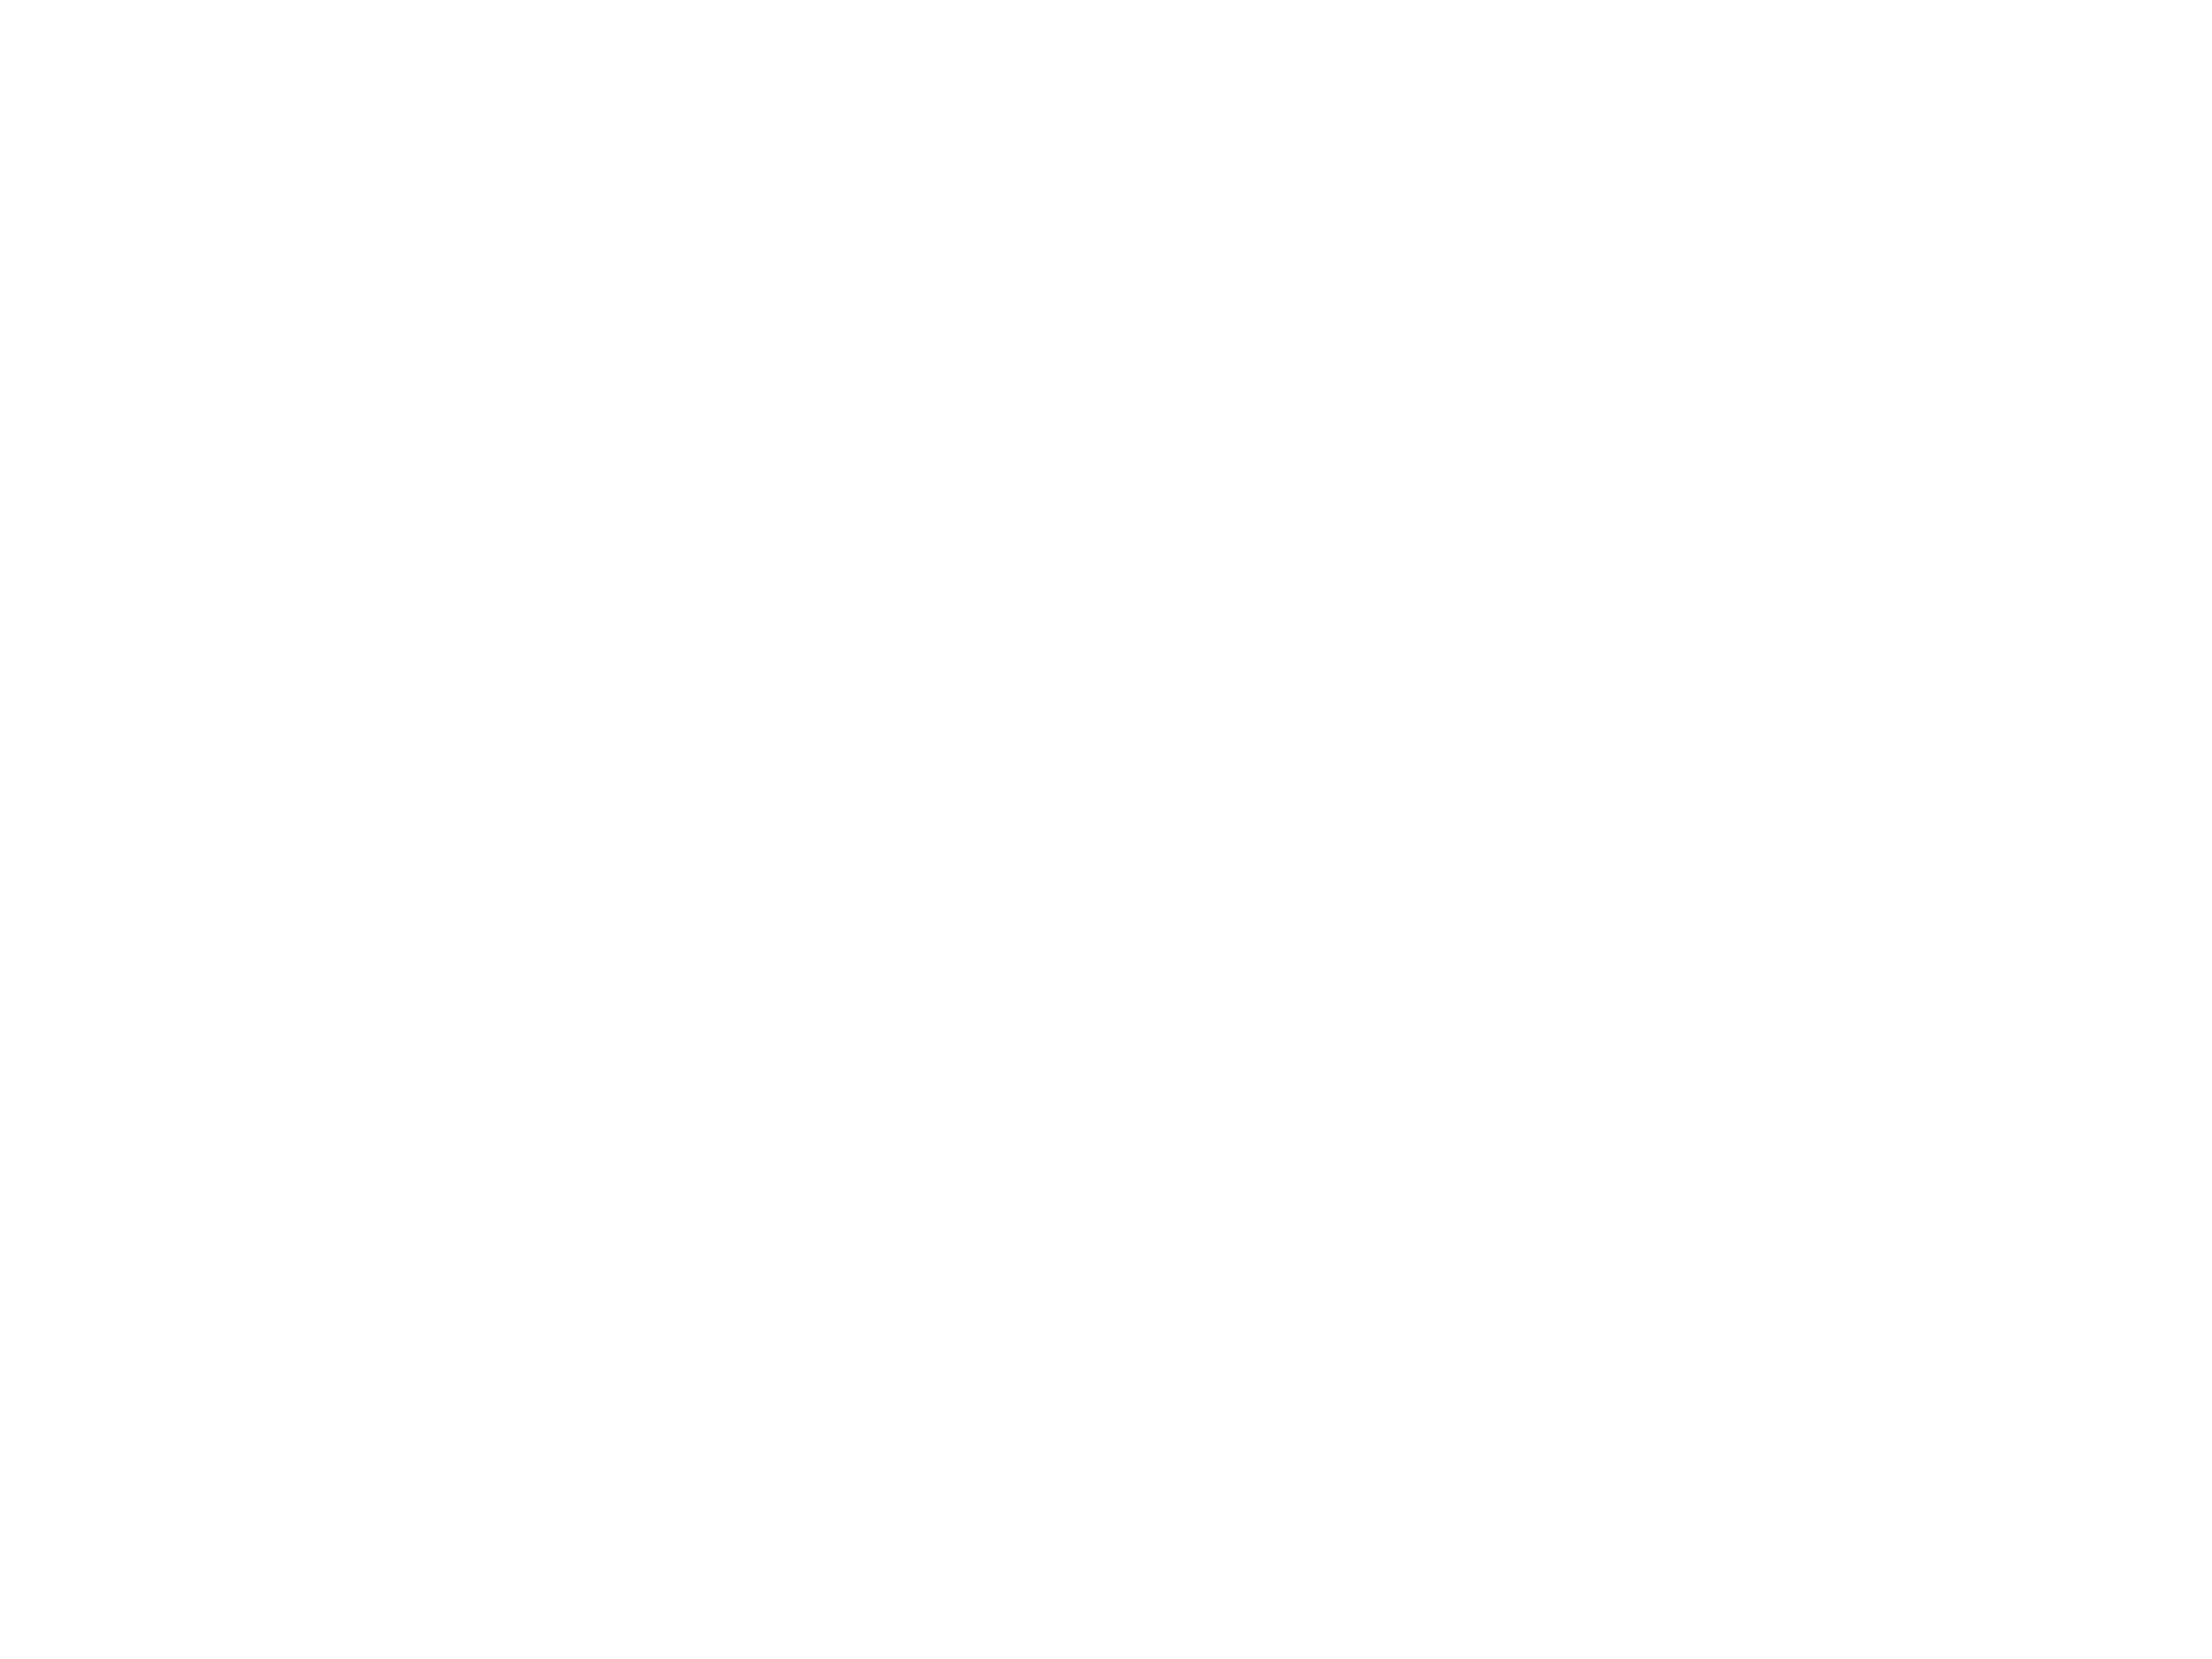 P1010674